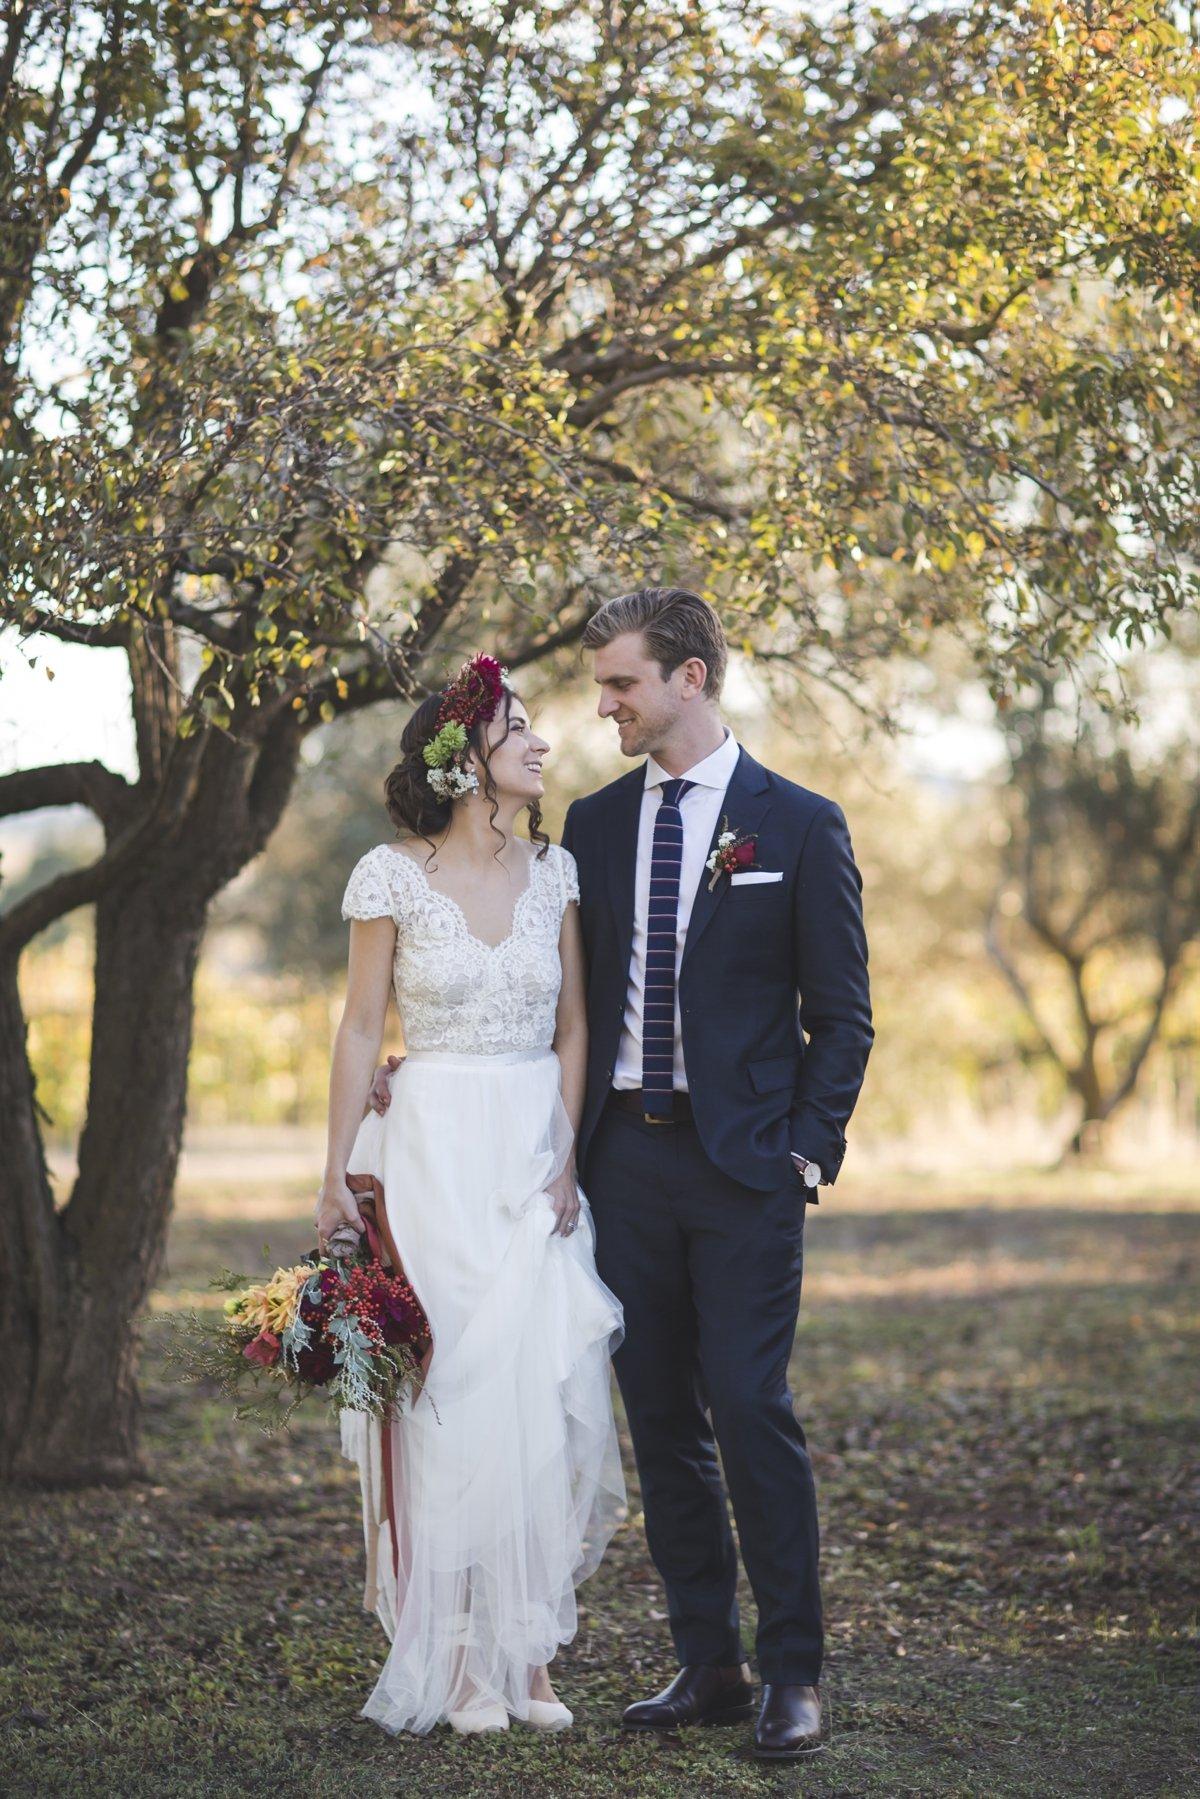 Wagga Wagga Wedding Photographer at Borambola Winery Wagga Wagga Albury wedding photographer Culcairn wedding venue_1194